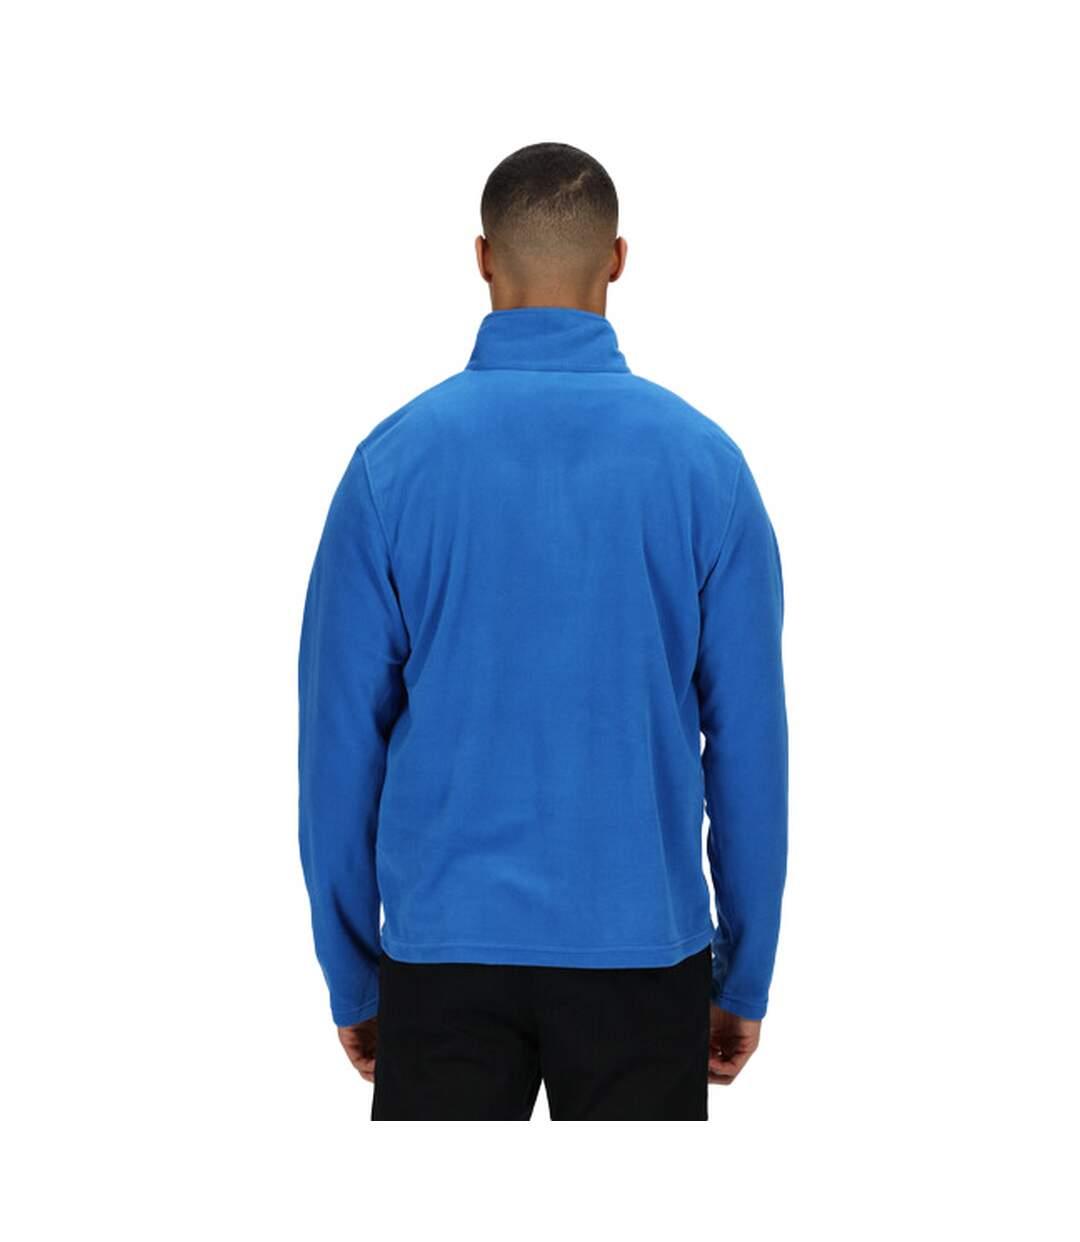 Regatta - Polaire - Homme (Bleu marine) - UTRG1580